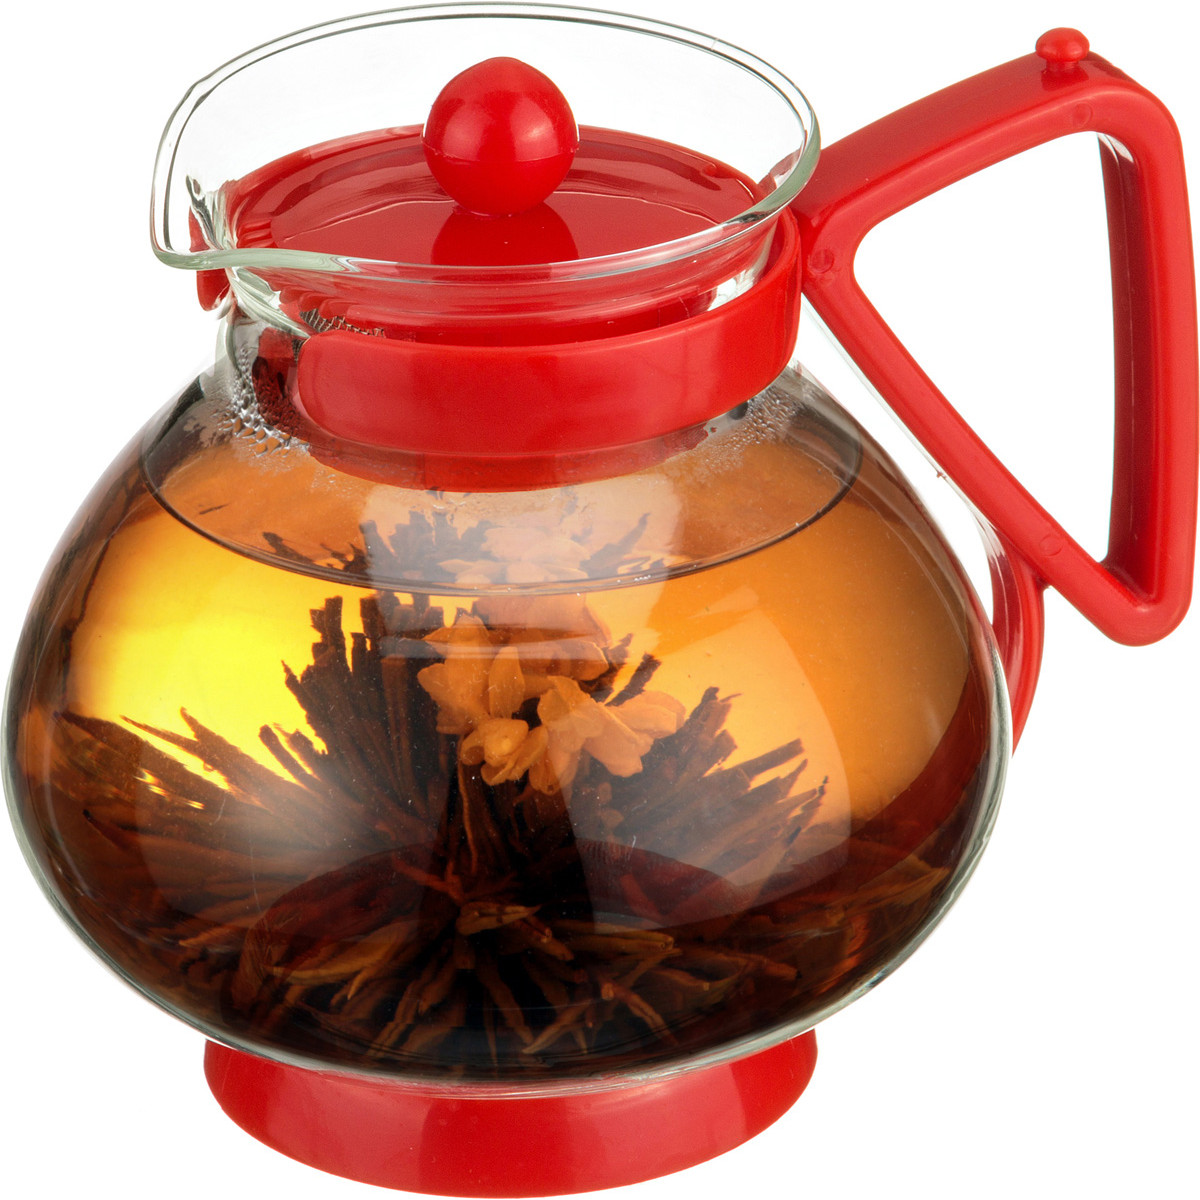 чайник заварочный hunan provincial лотос 600 мл {} Agness Сервиз Don  (600 мл)